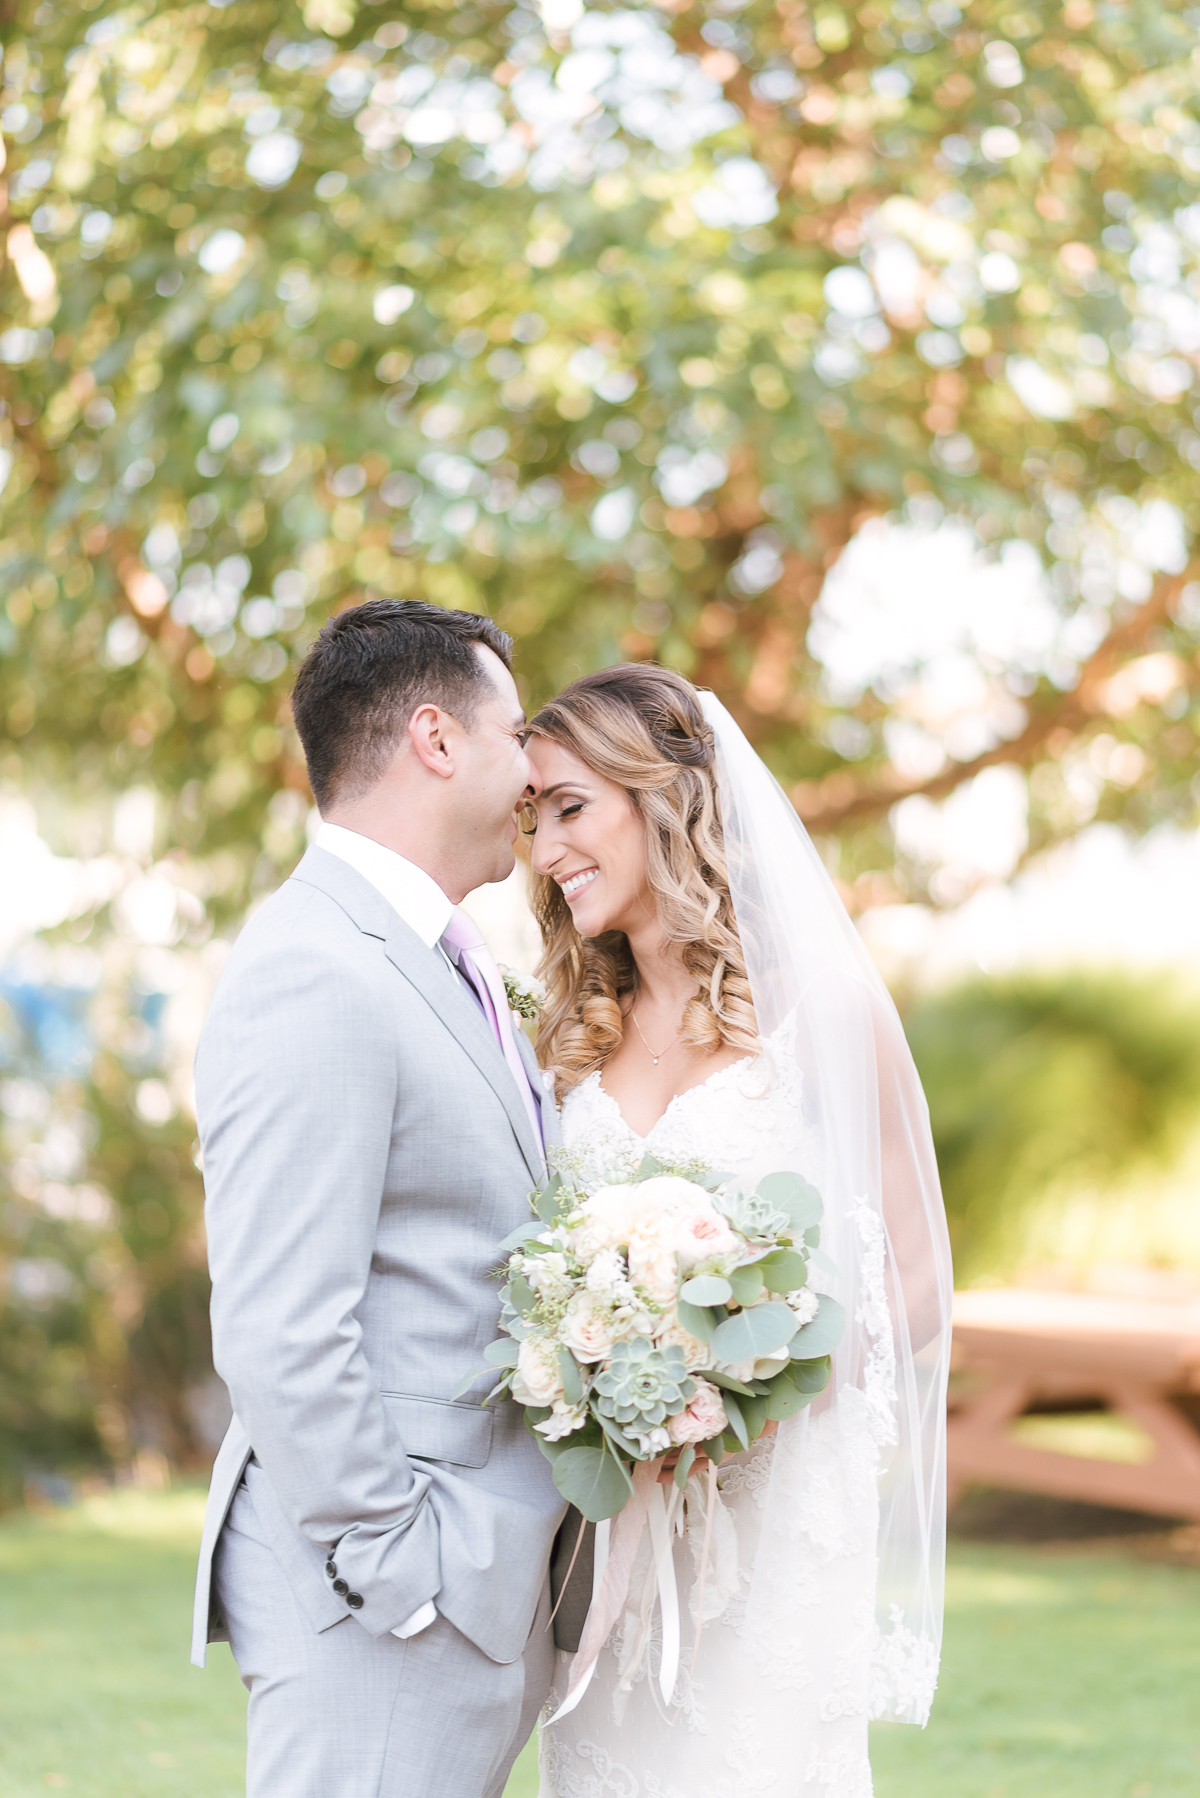 MD-Herrington-on-the-Bay-Wedding-Bridal-Portrait-34.jpg